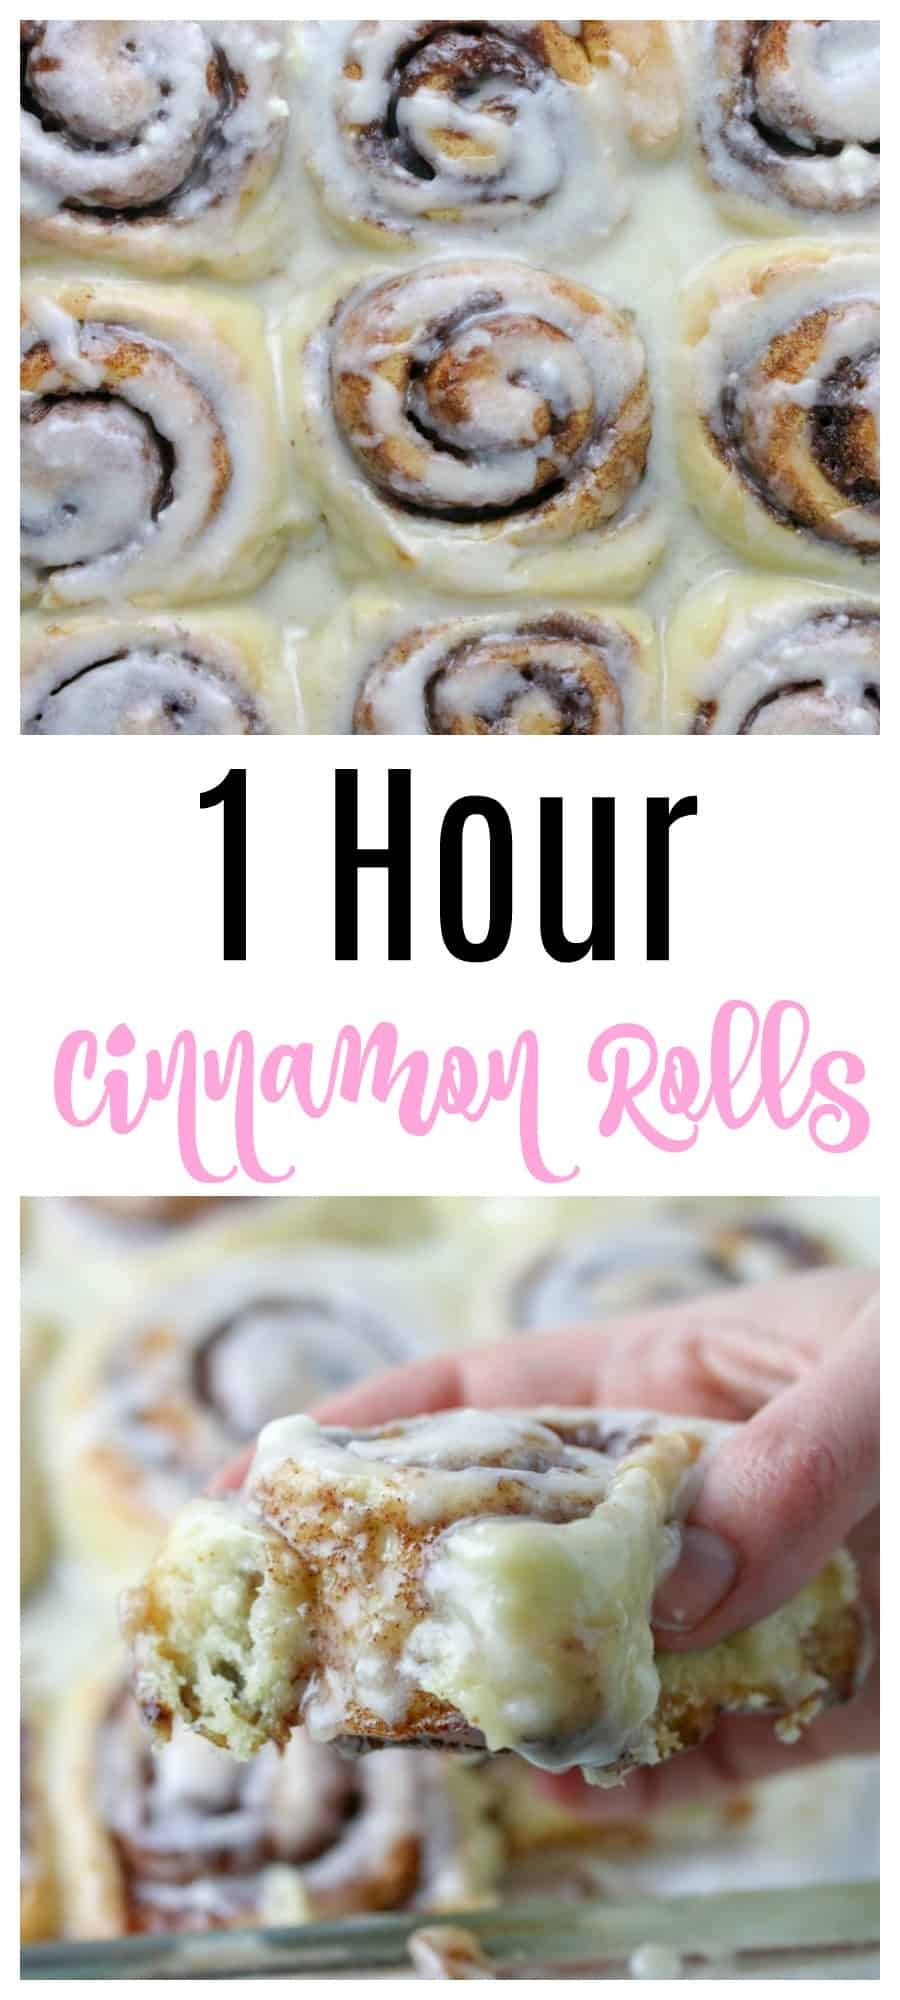 1 Hour Cinnamon Rolls Recipe Cinnamon Rolls Recipe Cinnabon Cinnamon Rolls Cinnamon Rolls Homemade